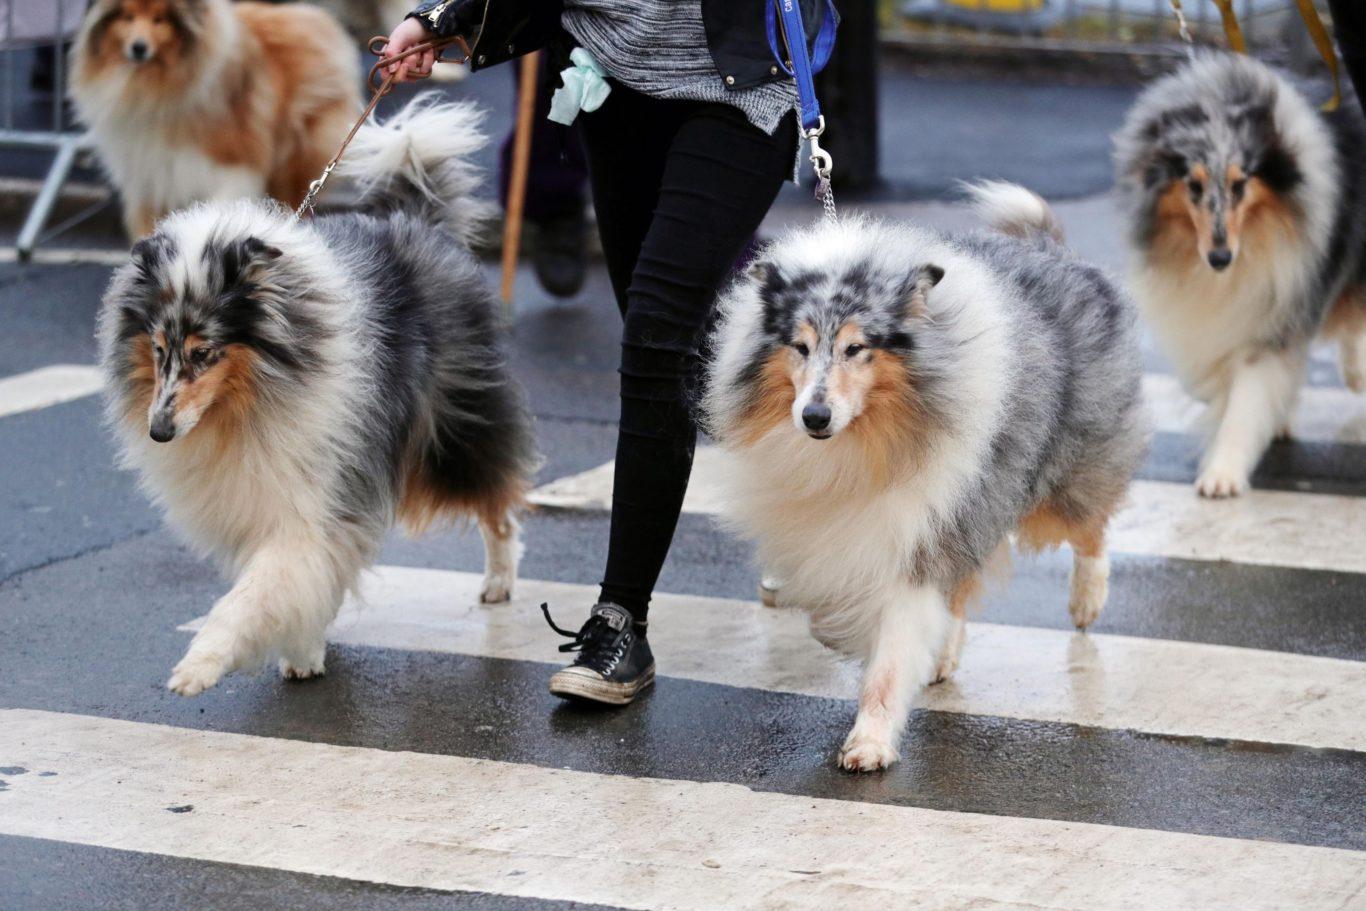 Simple Icelandic Sheepdog Canine Adorable Dog - cb20763f-1437-486a-9633-234dac13d13c-1366x911  Graphic_216745  .jpg